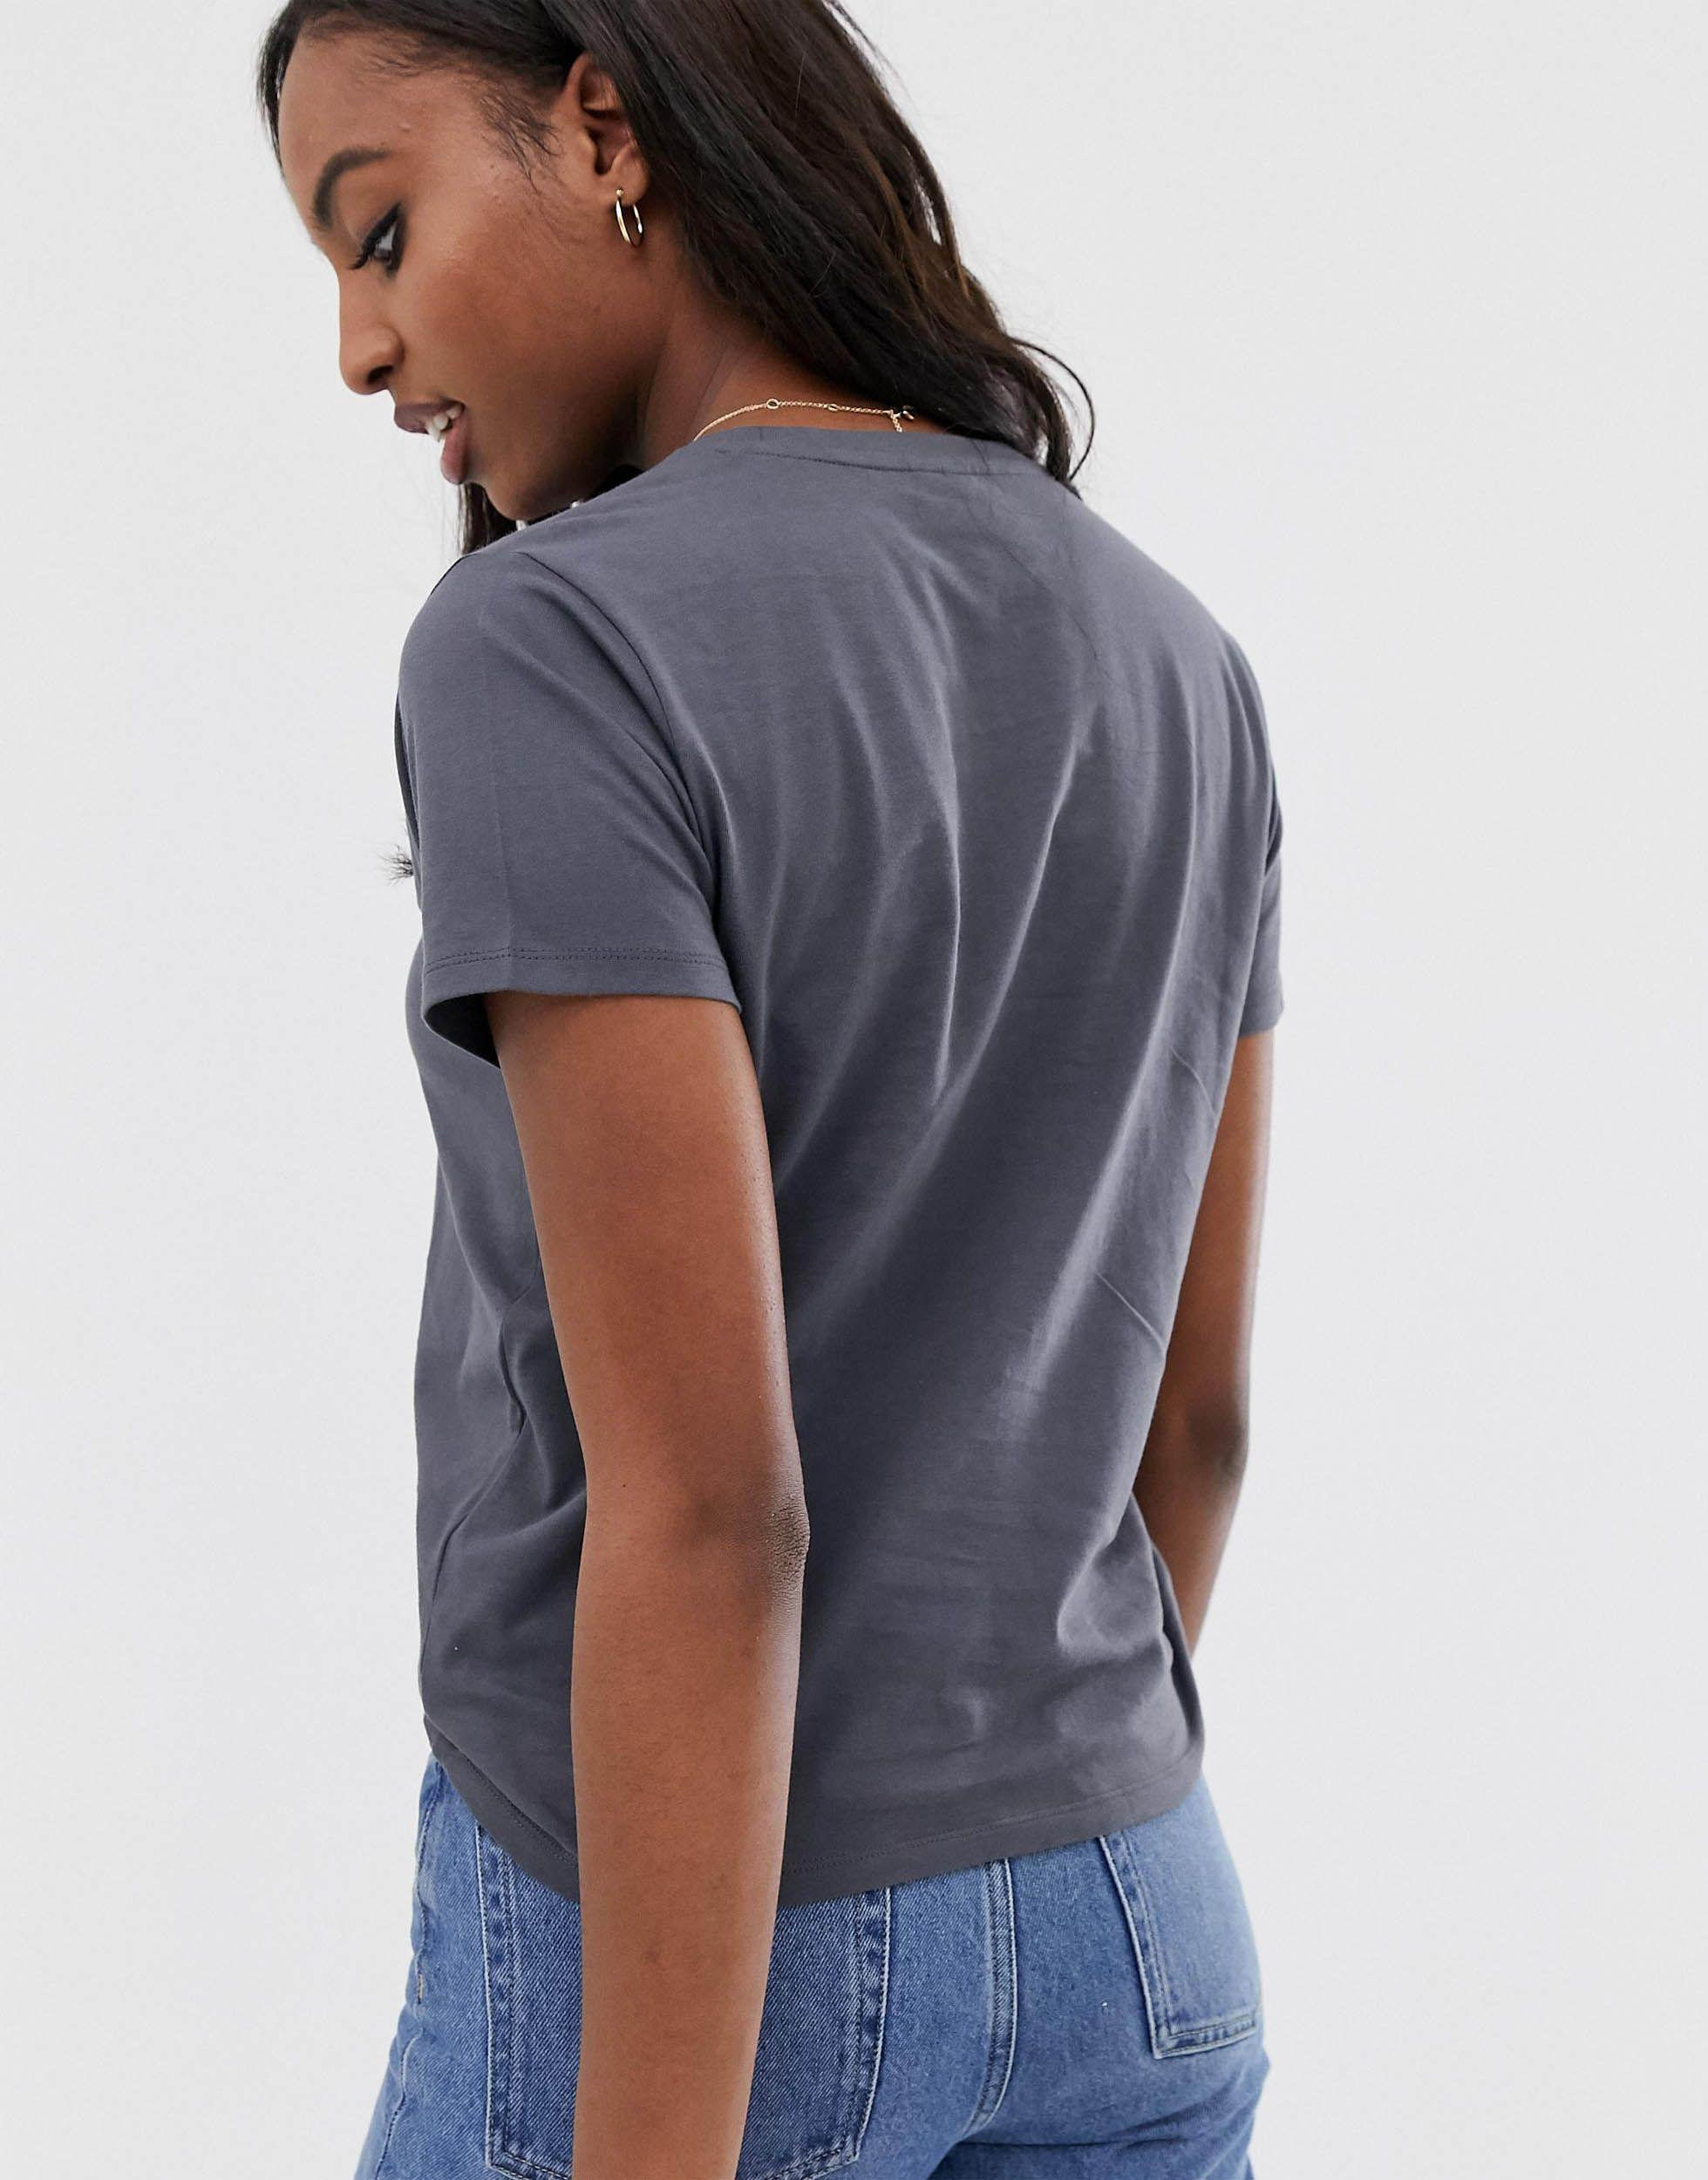 ASOS DESIGN Tall - Bye - T-shirt brodé Coton ASOS en coloris Blanc